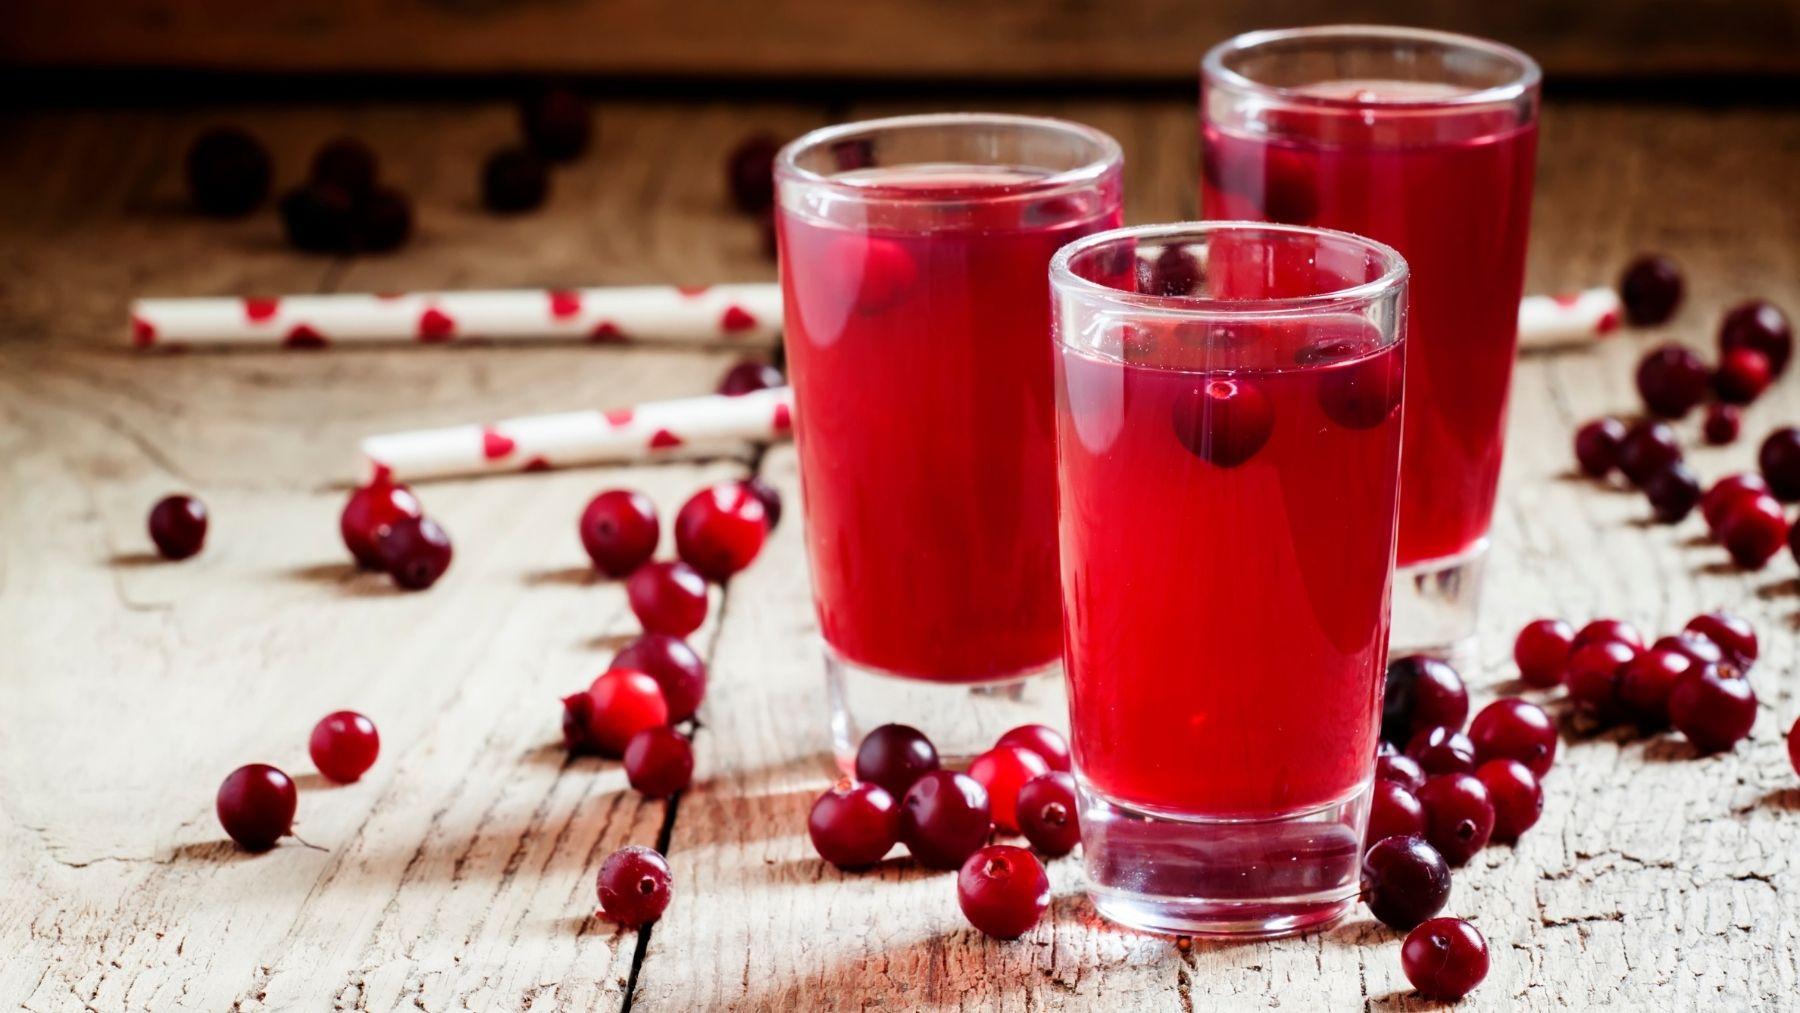 Receta de jugo o zumo de arándanos